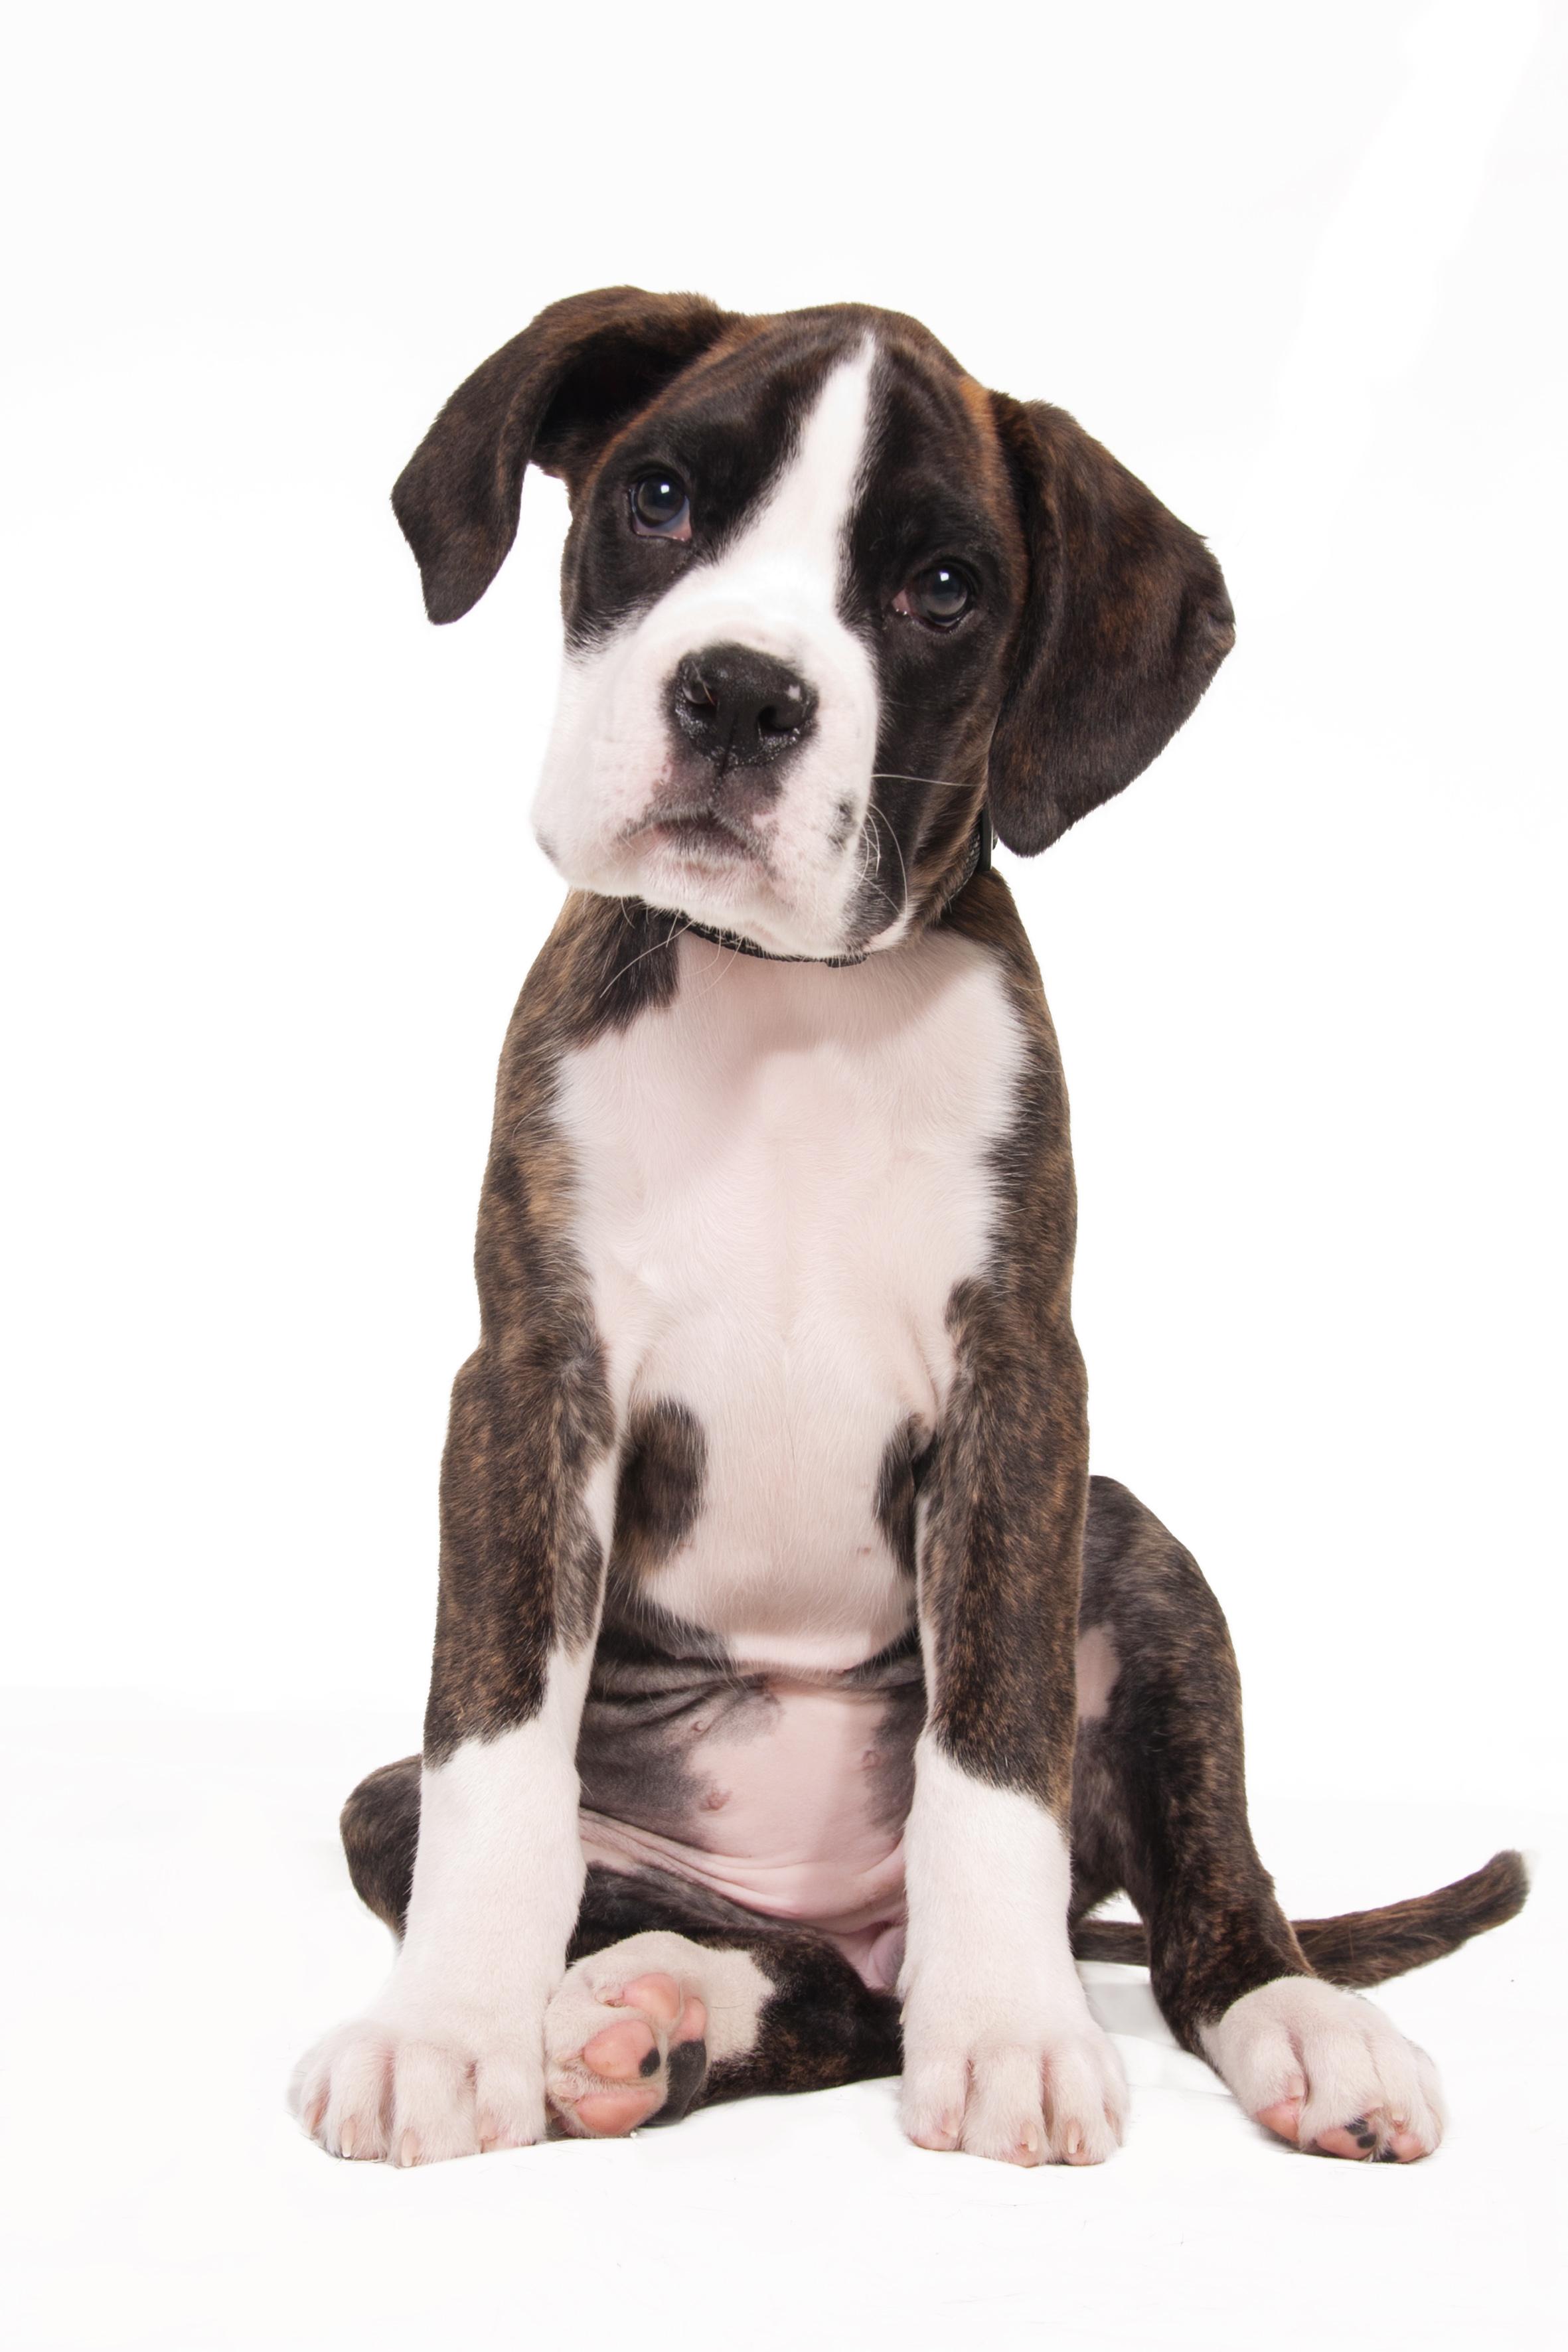 Cute boxer puppy photo